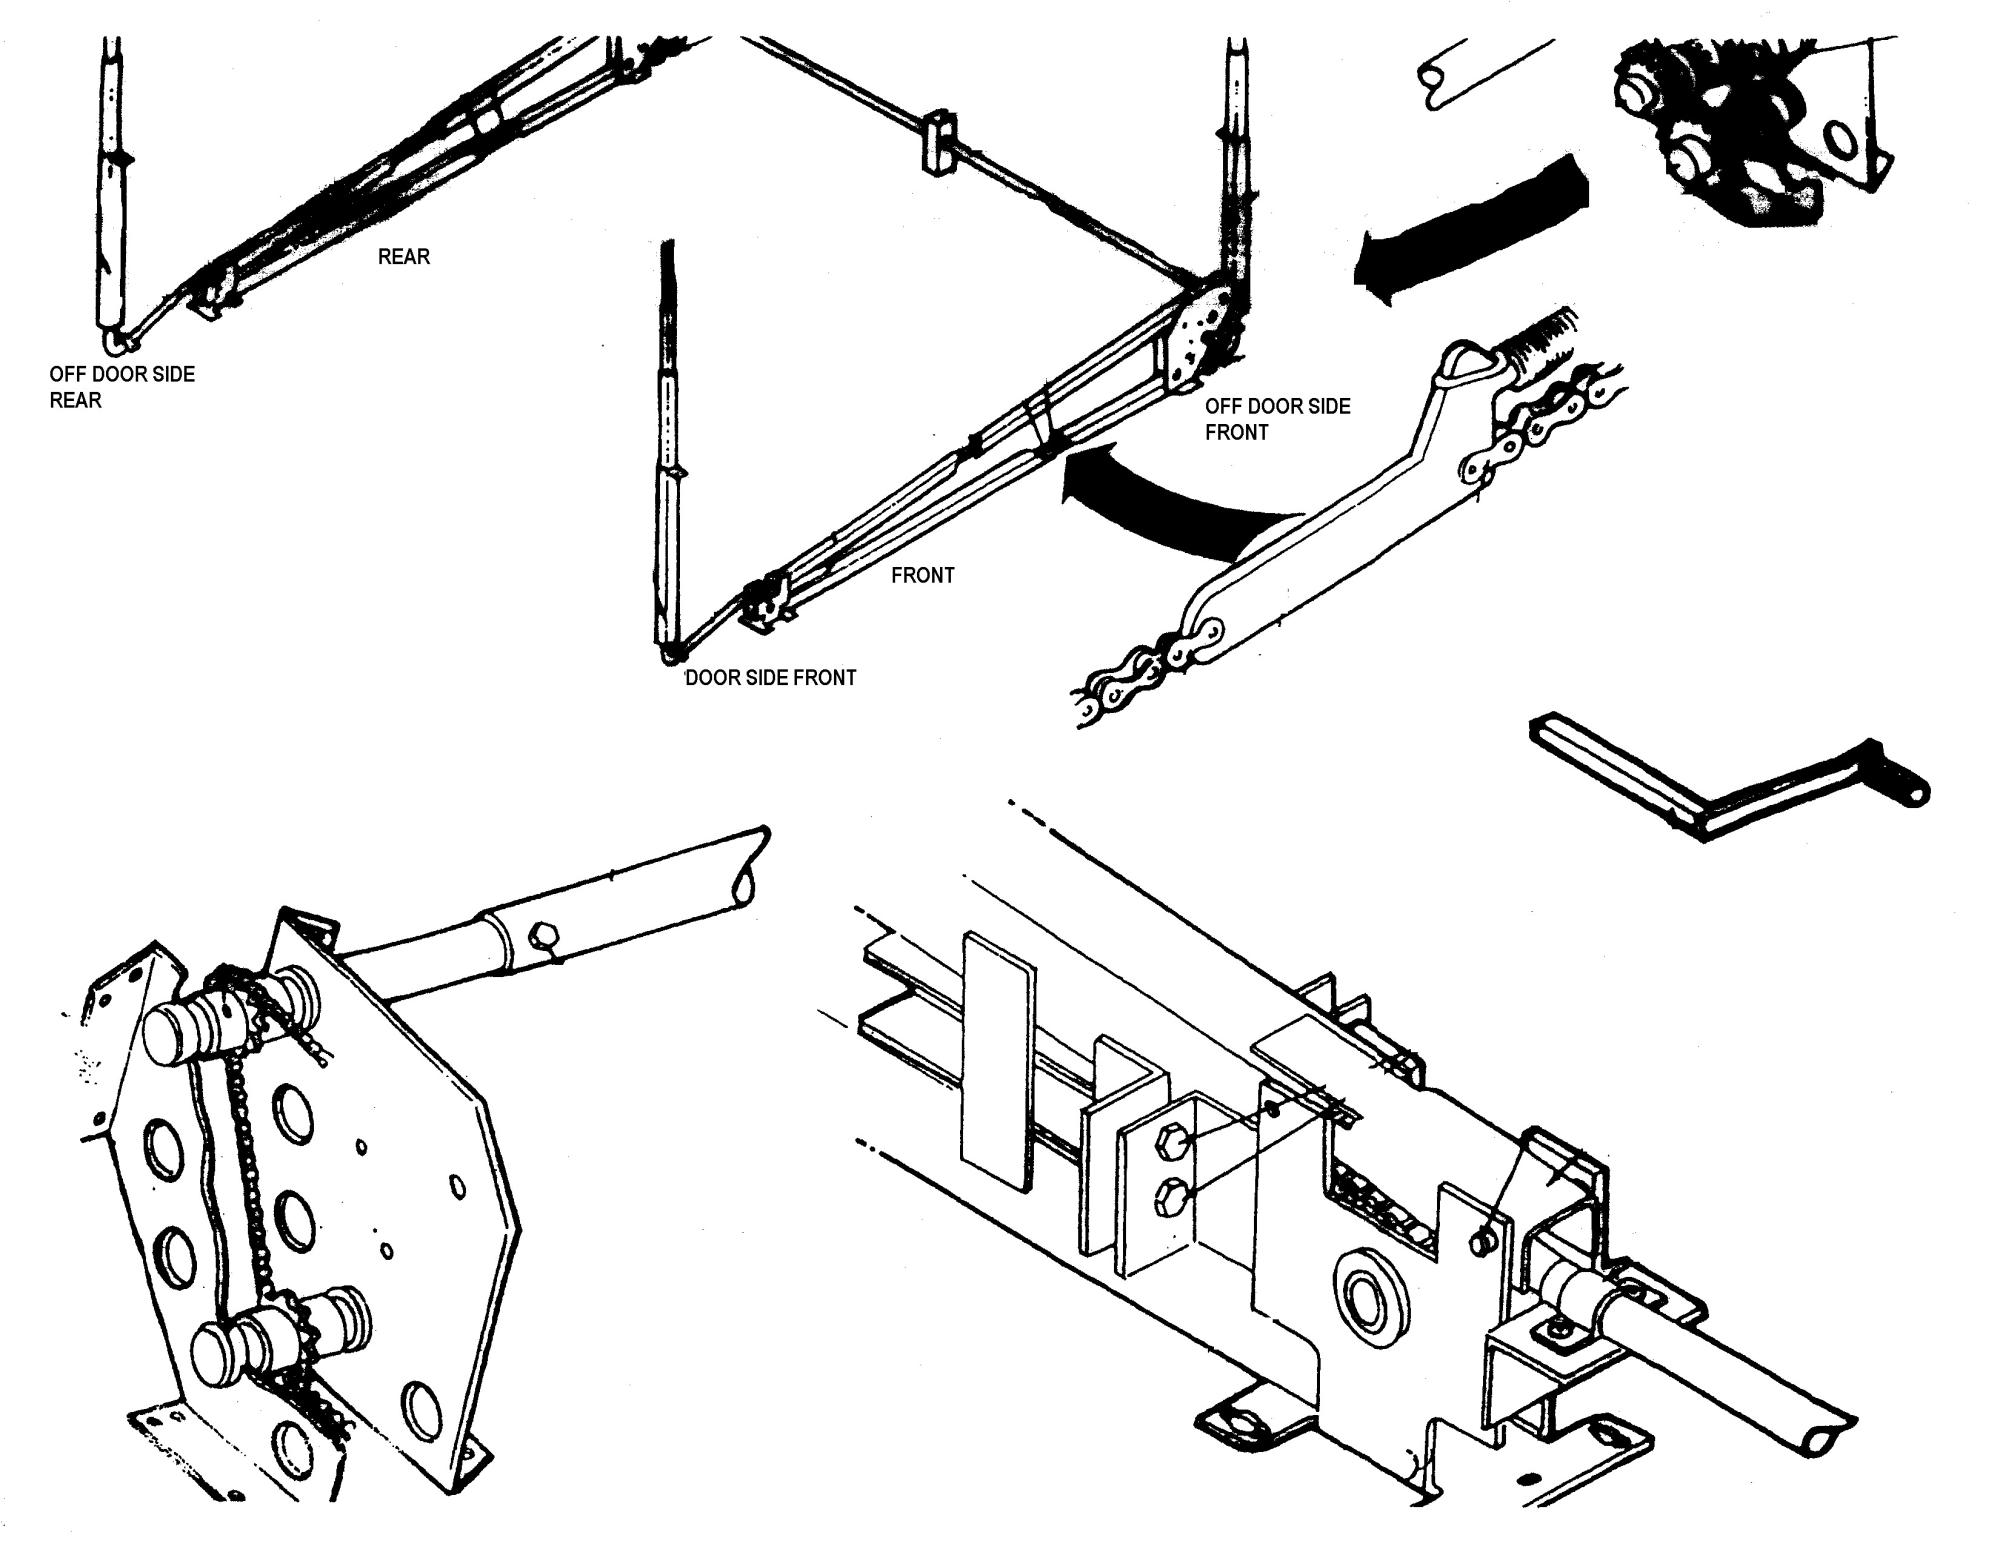 medium resolution of 1997 coleman seapine pop up camper wiring diagram